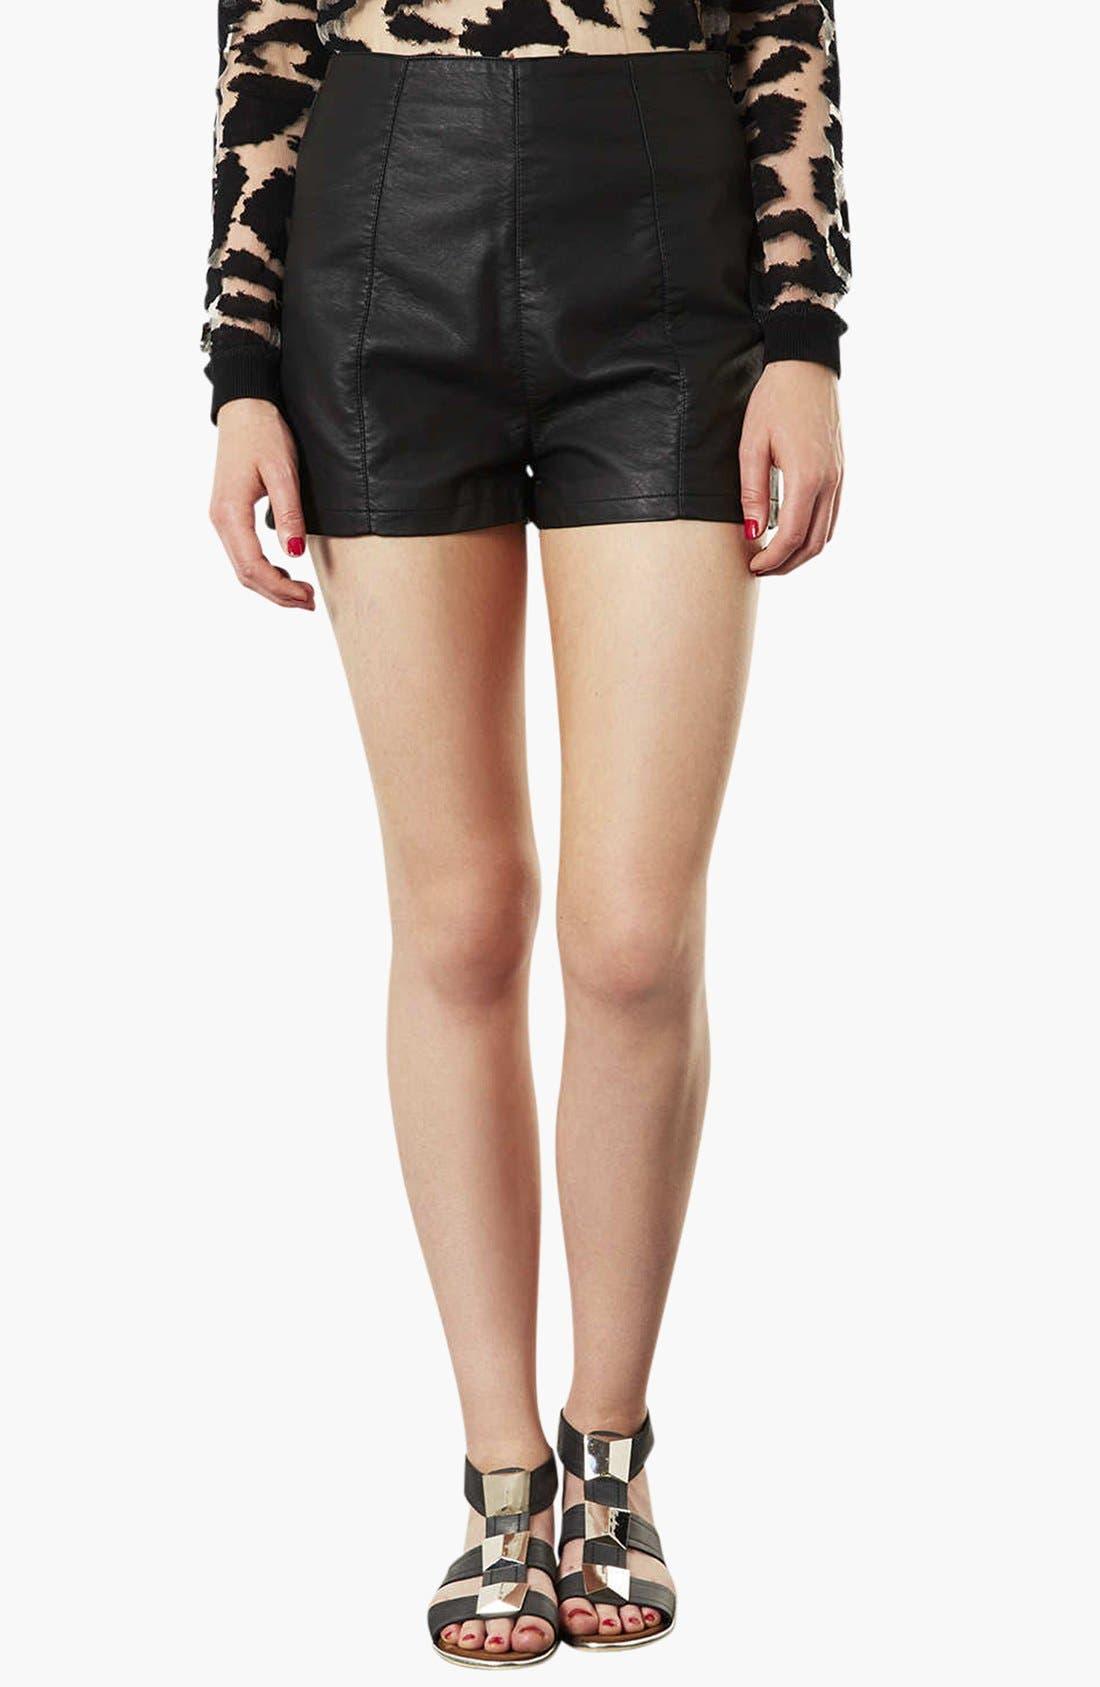 Main Image - Topshop 'Lola' High Waist Faux Leather Shorts